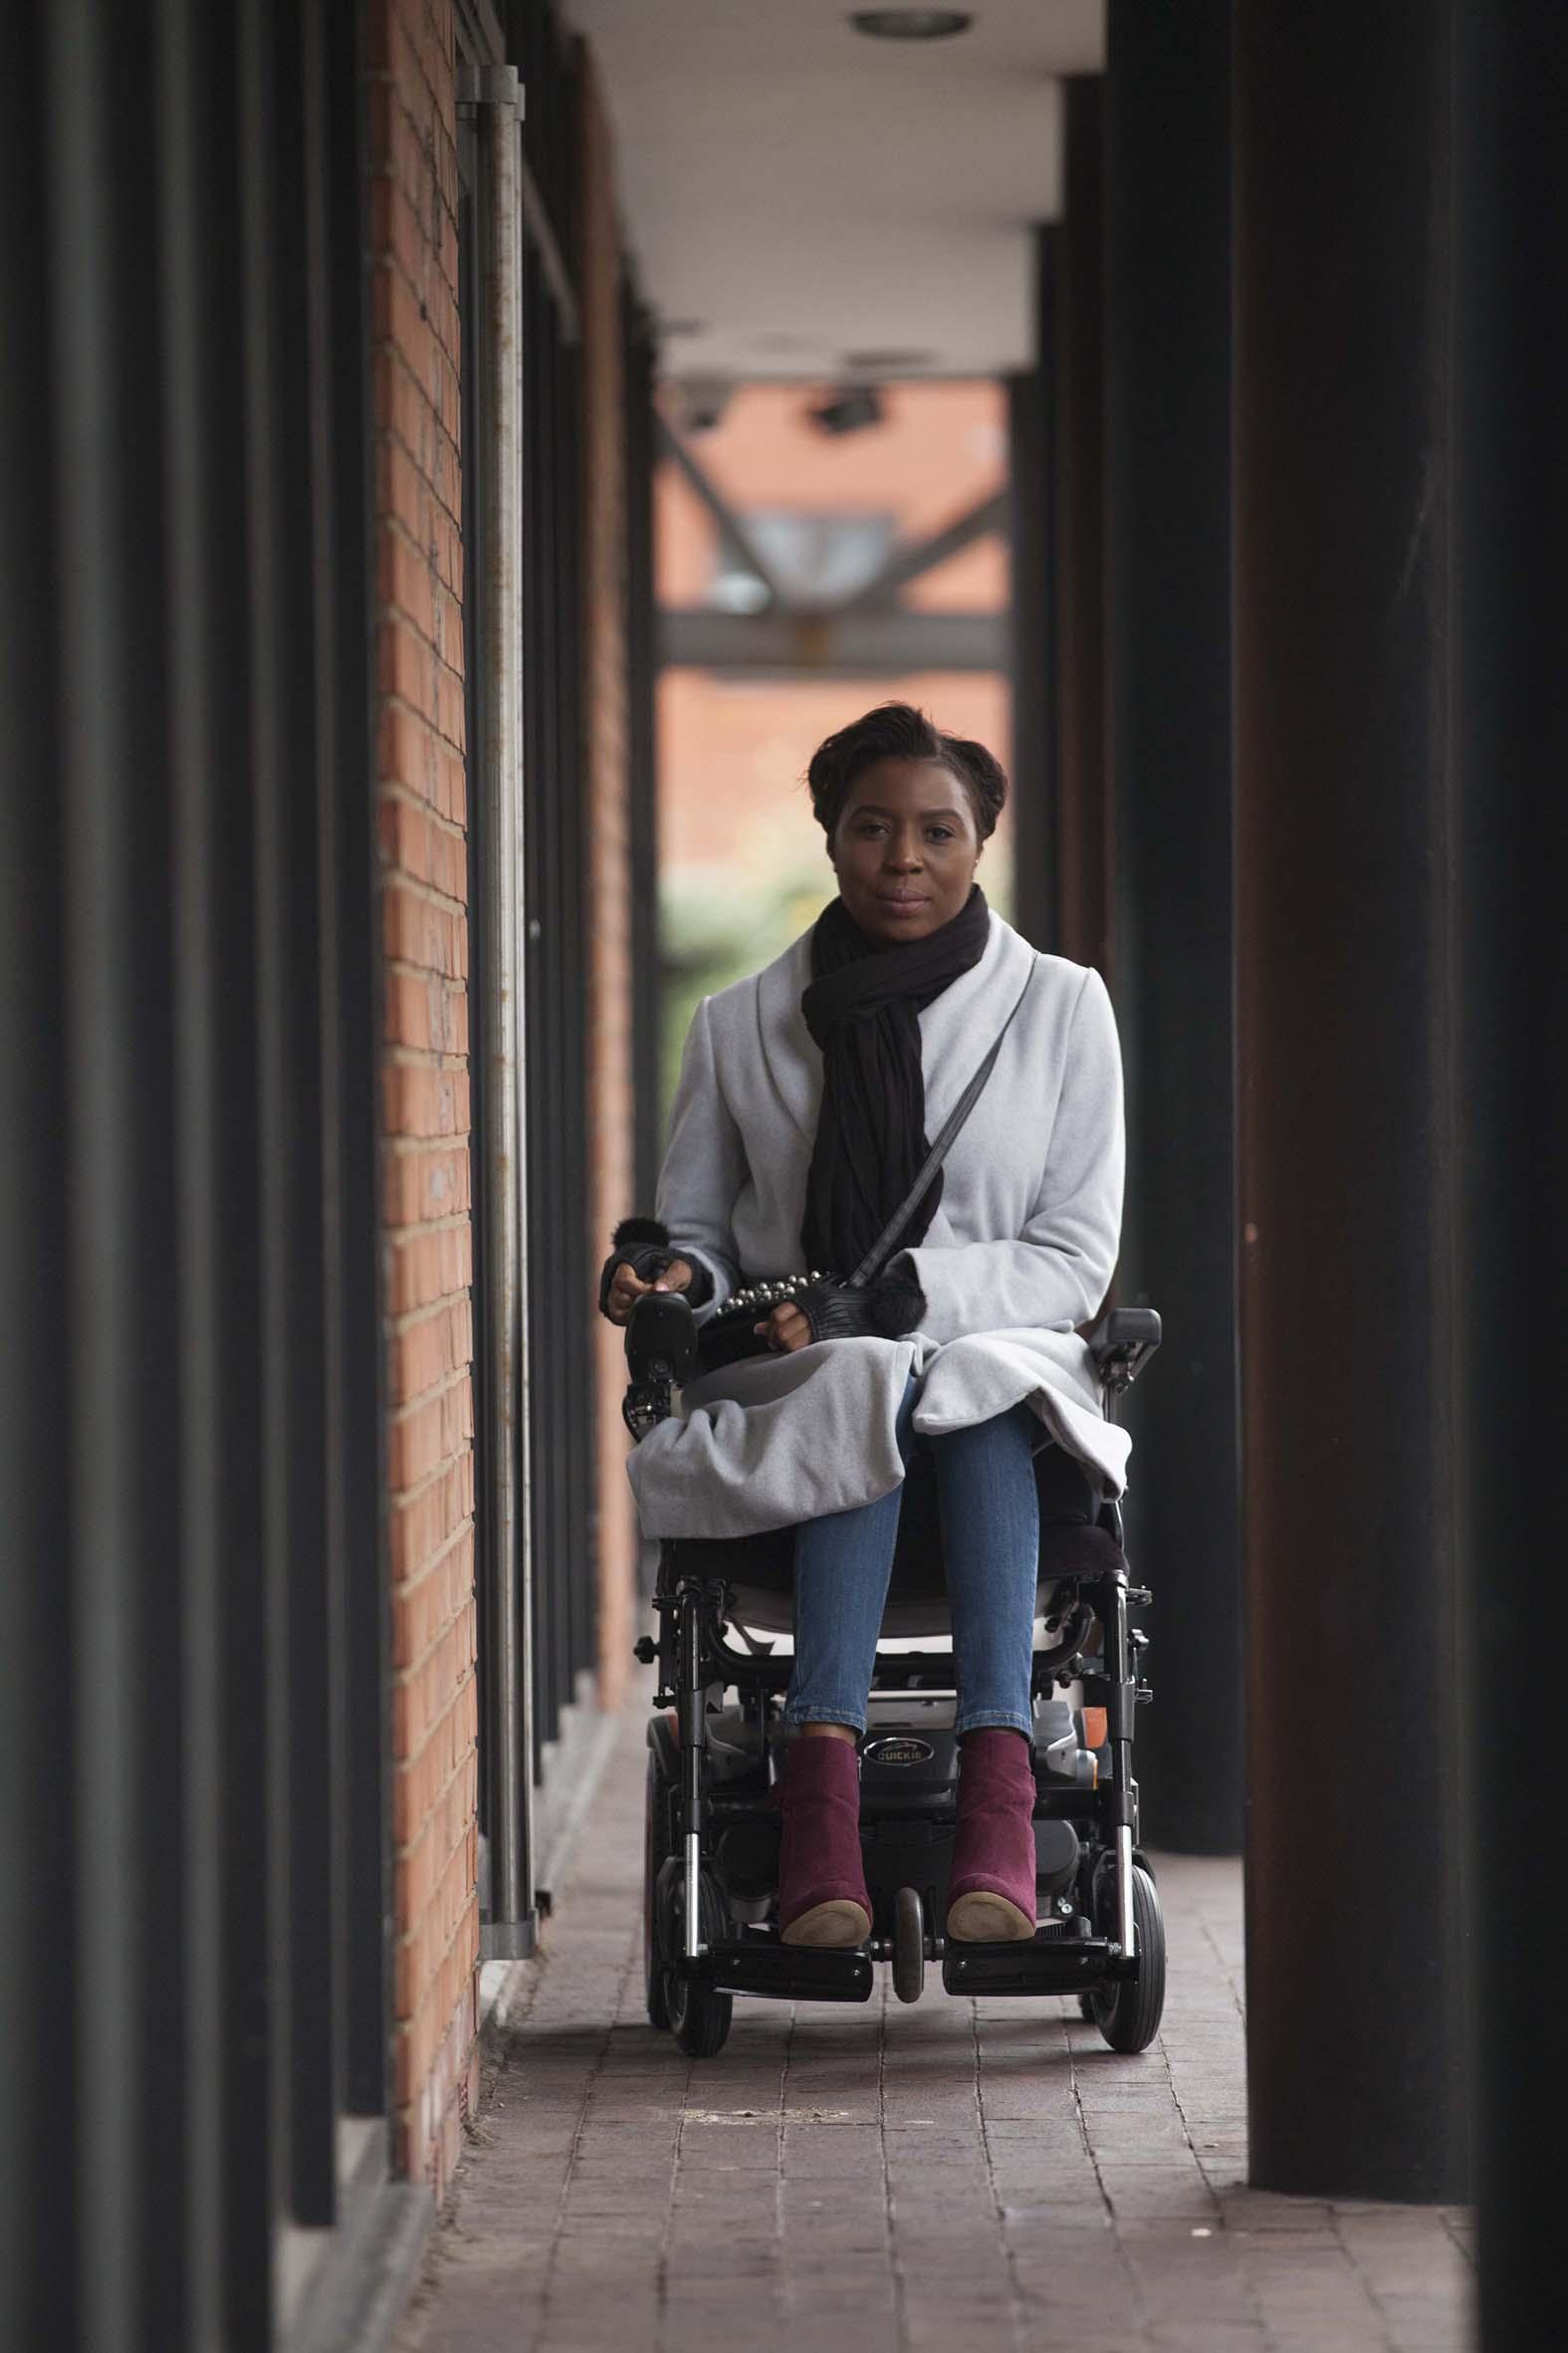 Clara, Wheelchair User, Zebedee Management, disabled, model agency, disability, Woman (1)